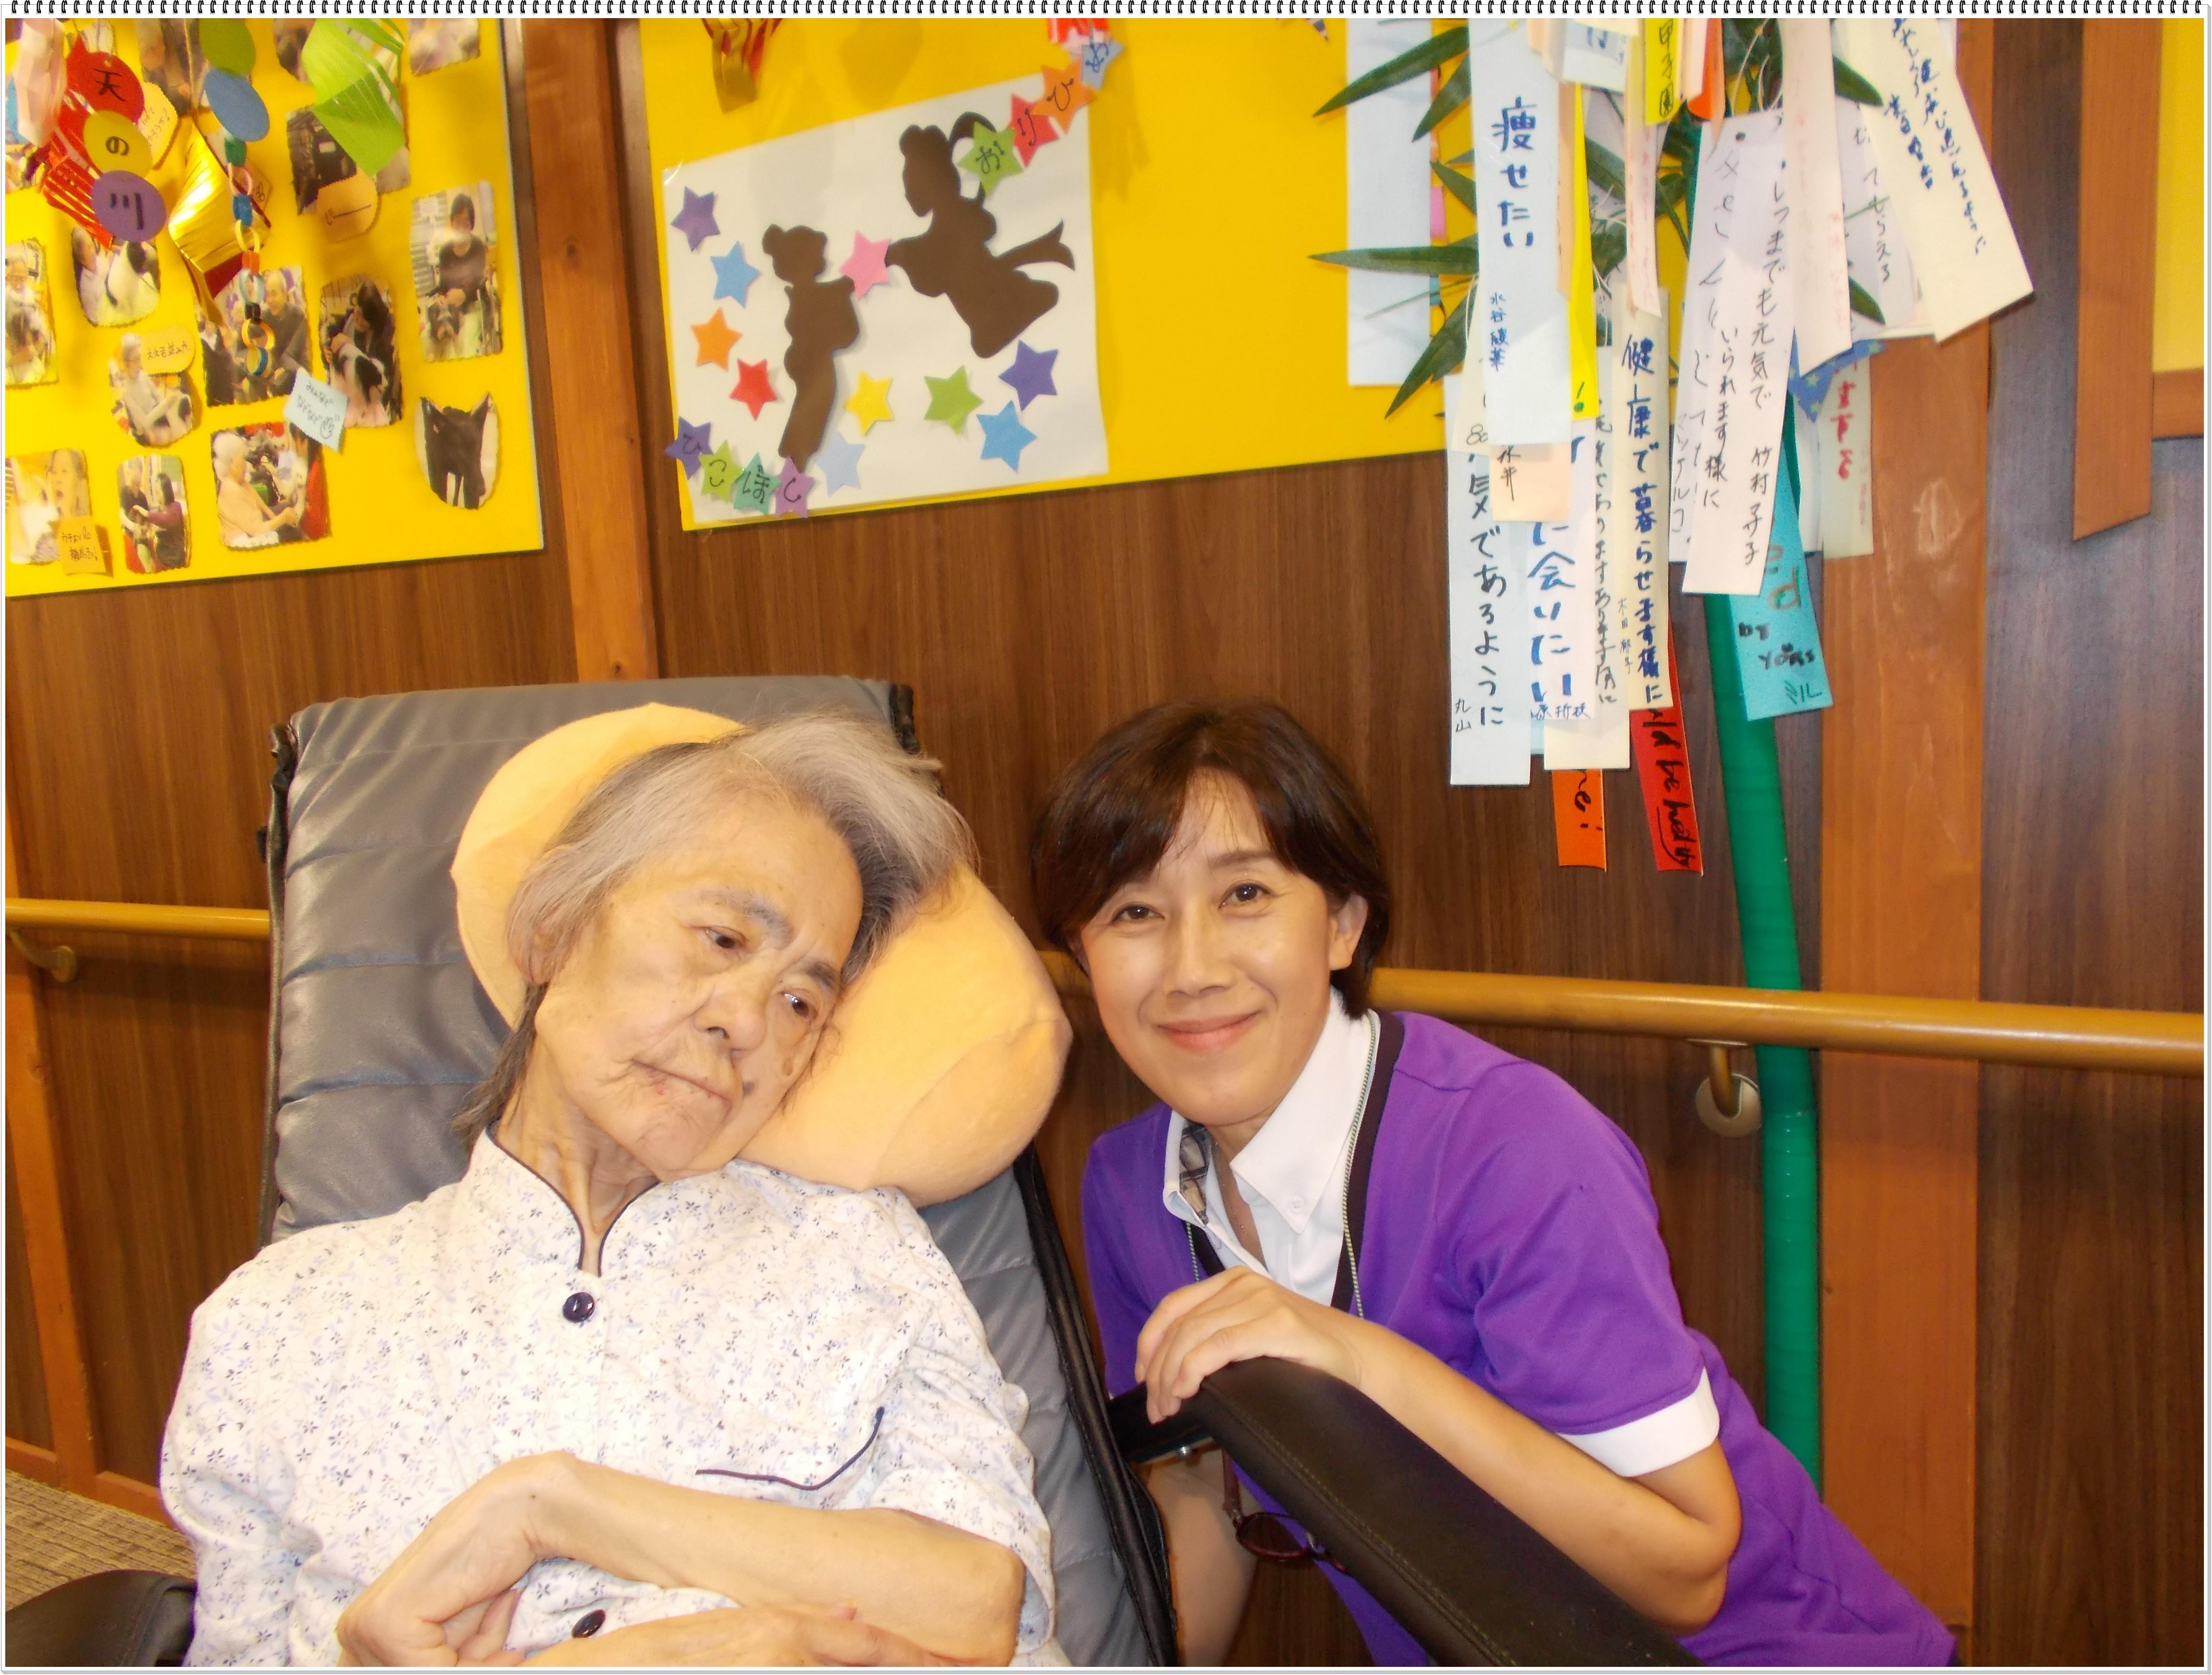 http://www.supercourt.jp/blog/hirano/DSCN3558.JPG